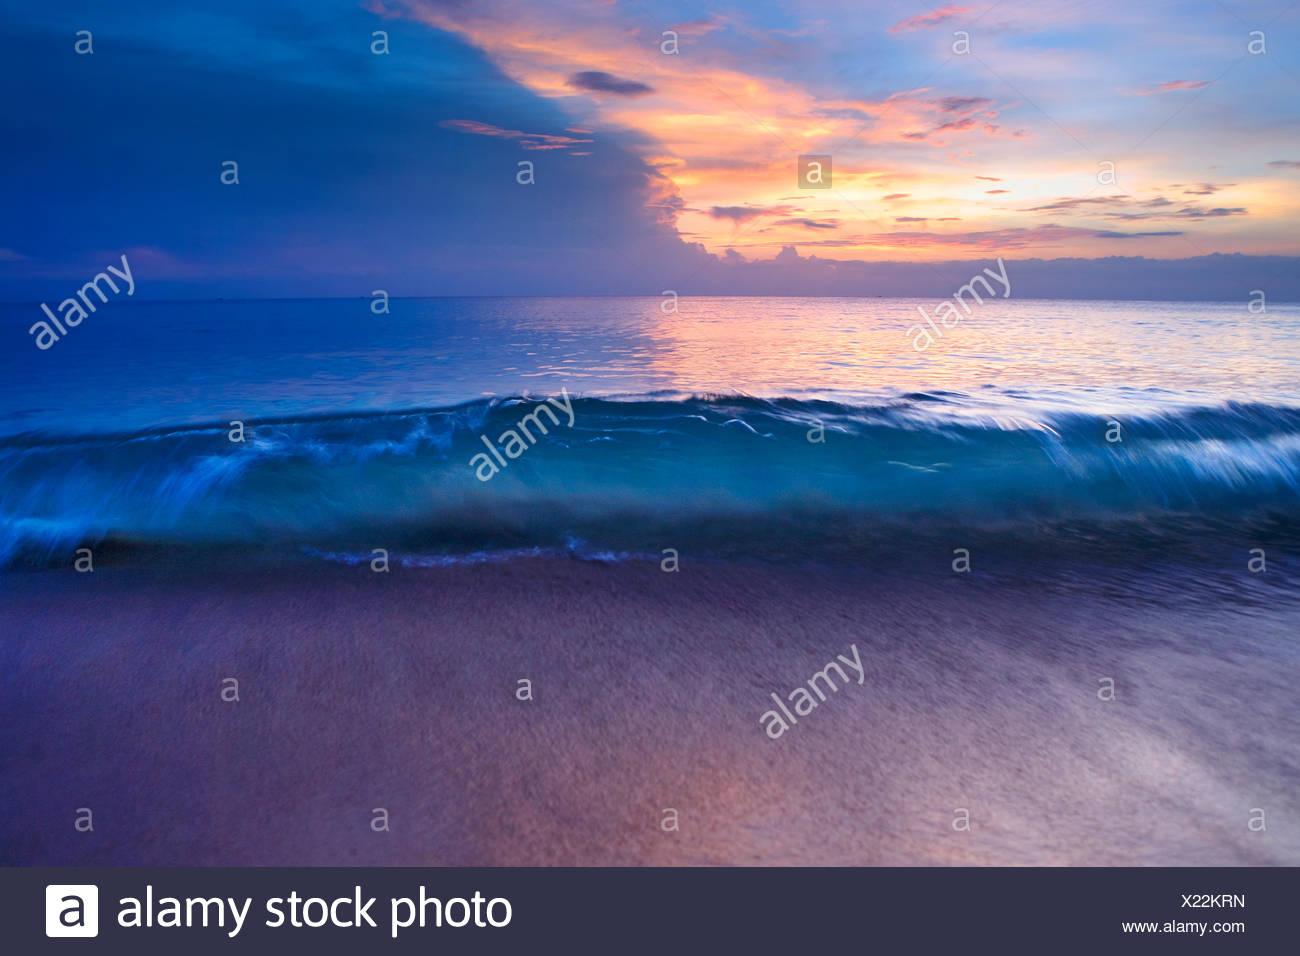 Thailand, Phuket, Karon Beach, Beach at dusk - Stock Image